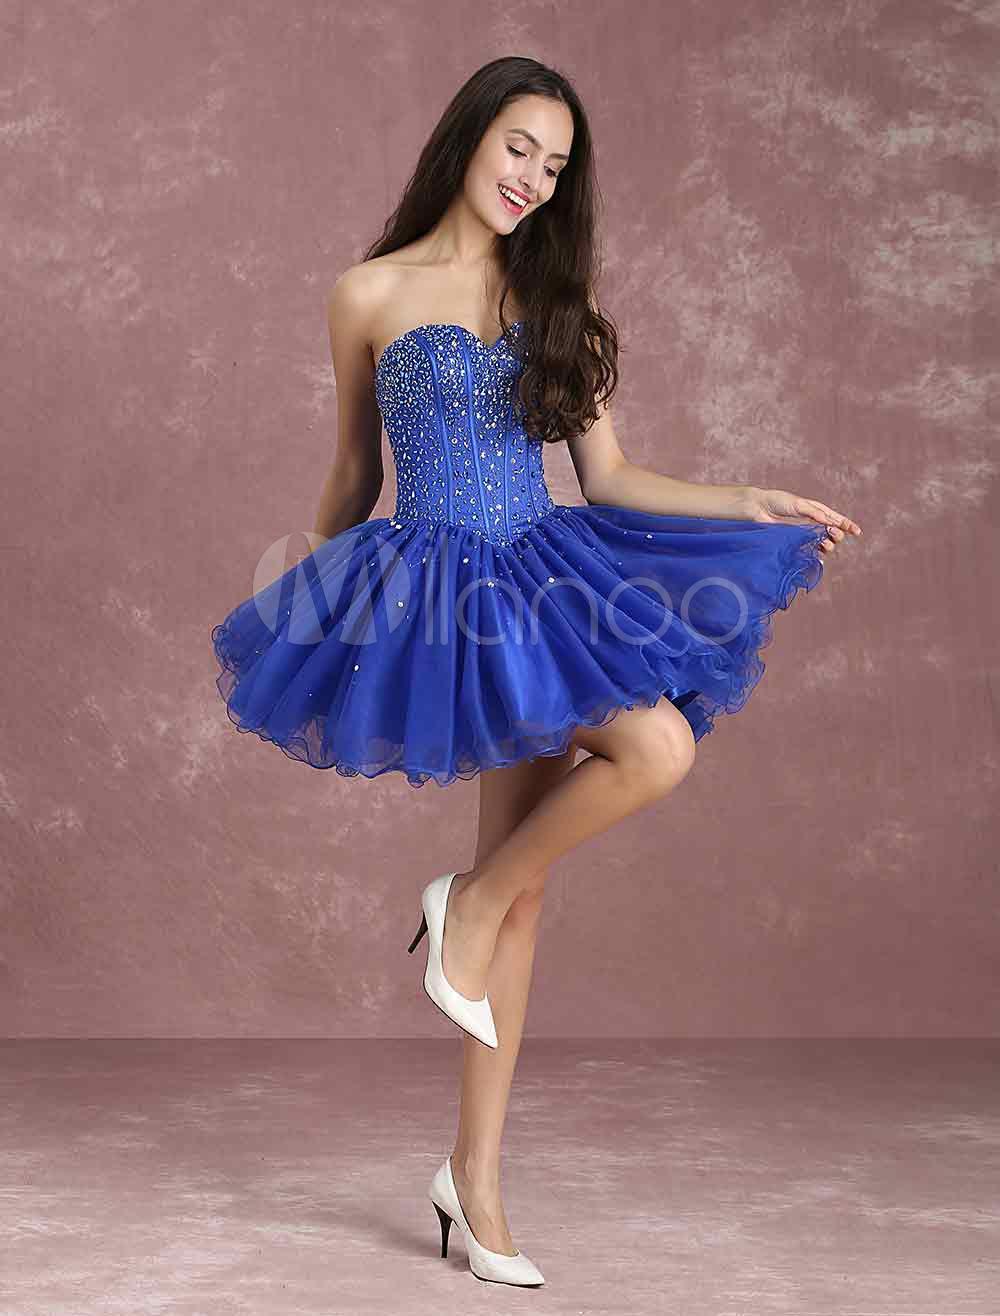 Buy Royal Blue Prom Dresses Strapless Sleeveless Sweetheart Homecoming Dresses Short Beaded Cocktail Dress for $169.19 in Milanoo store